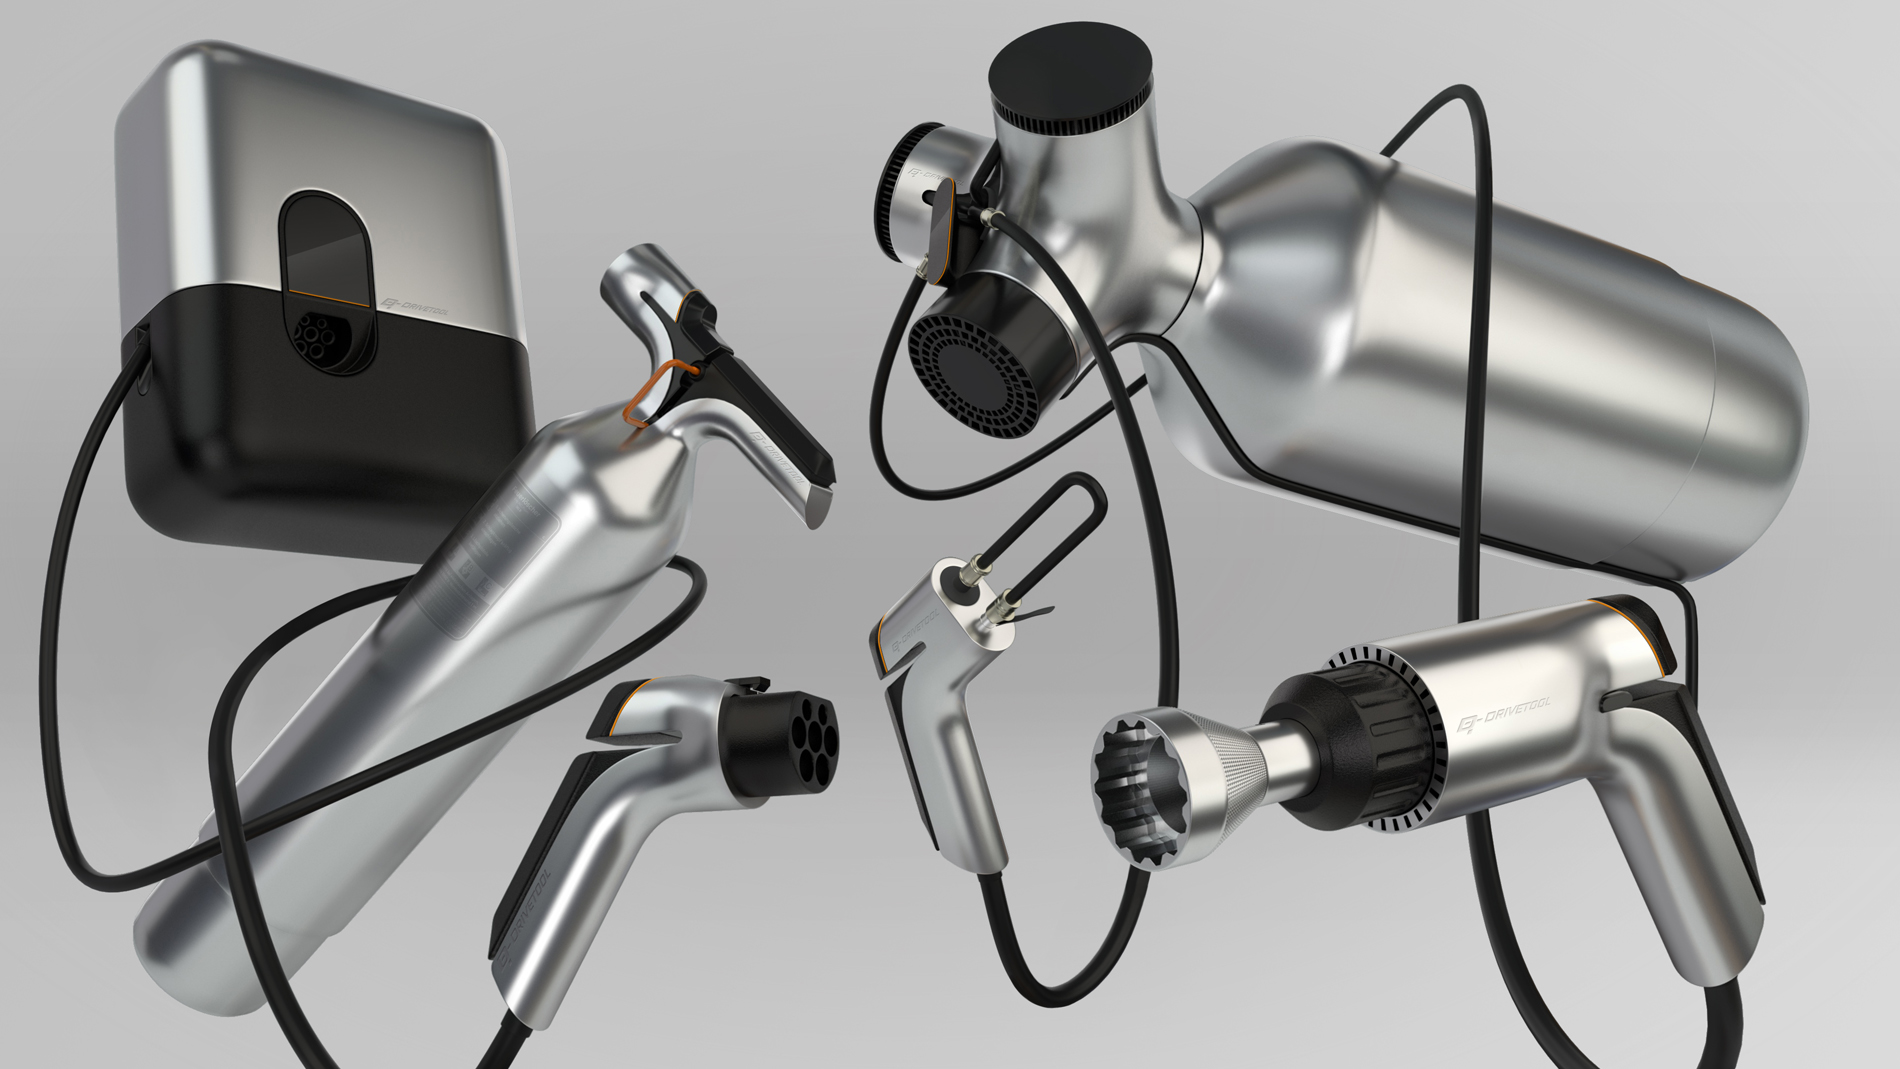 grey & black concept design tool family floating randomly in grey space